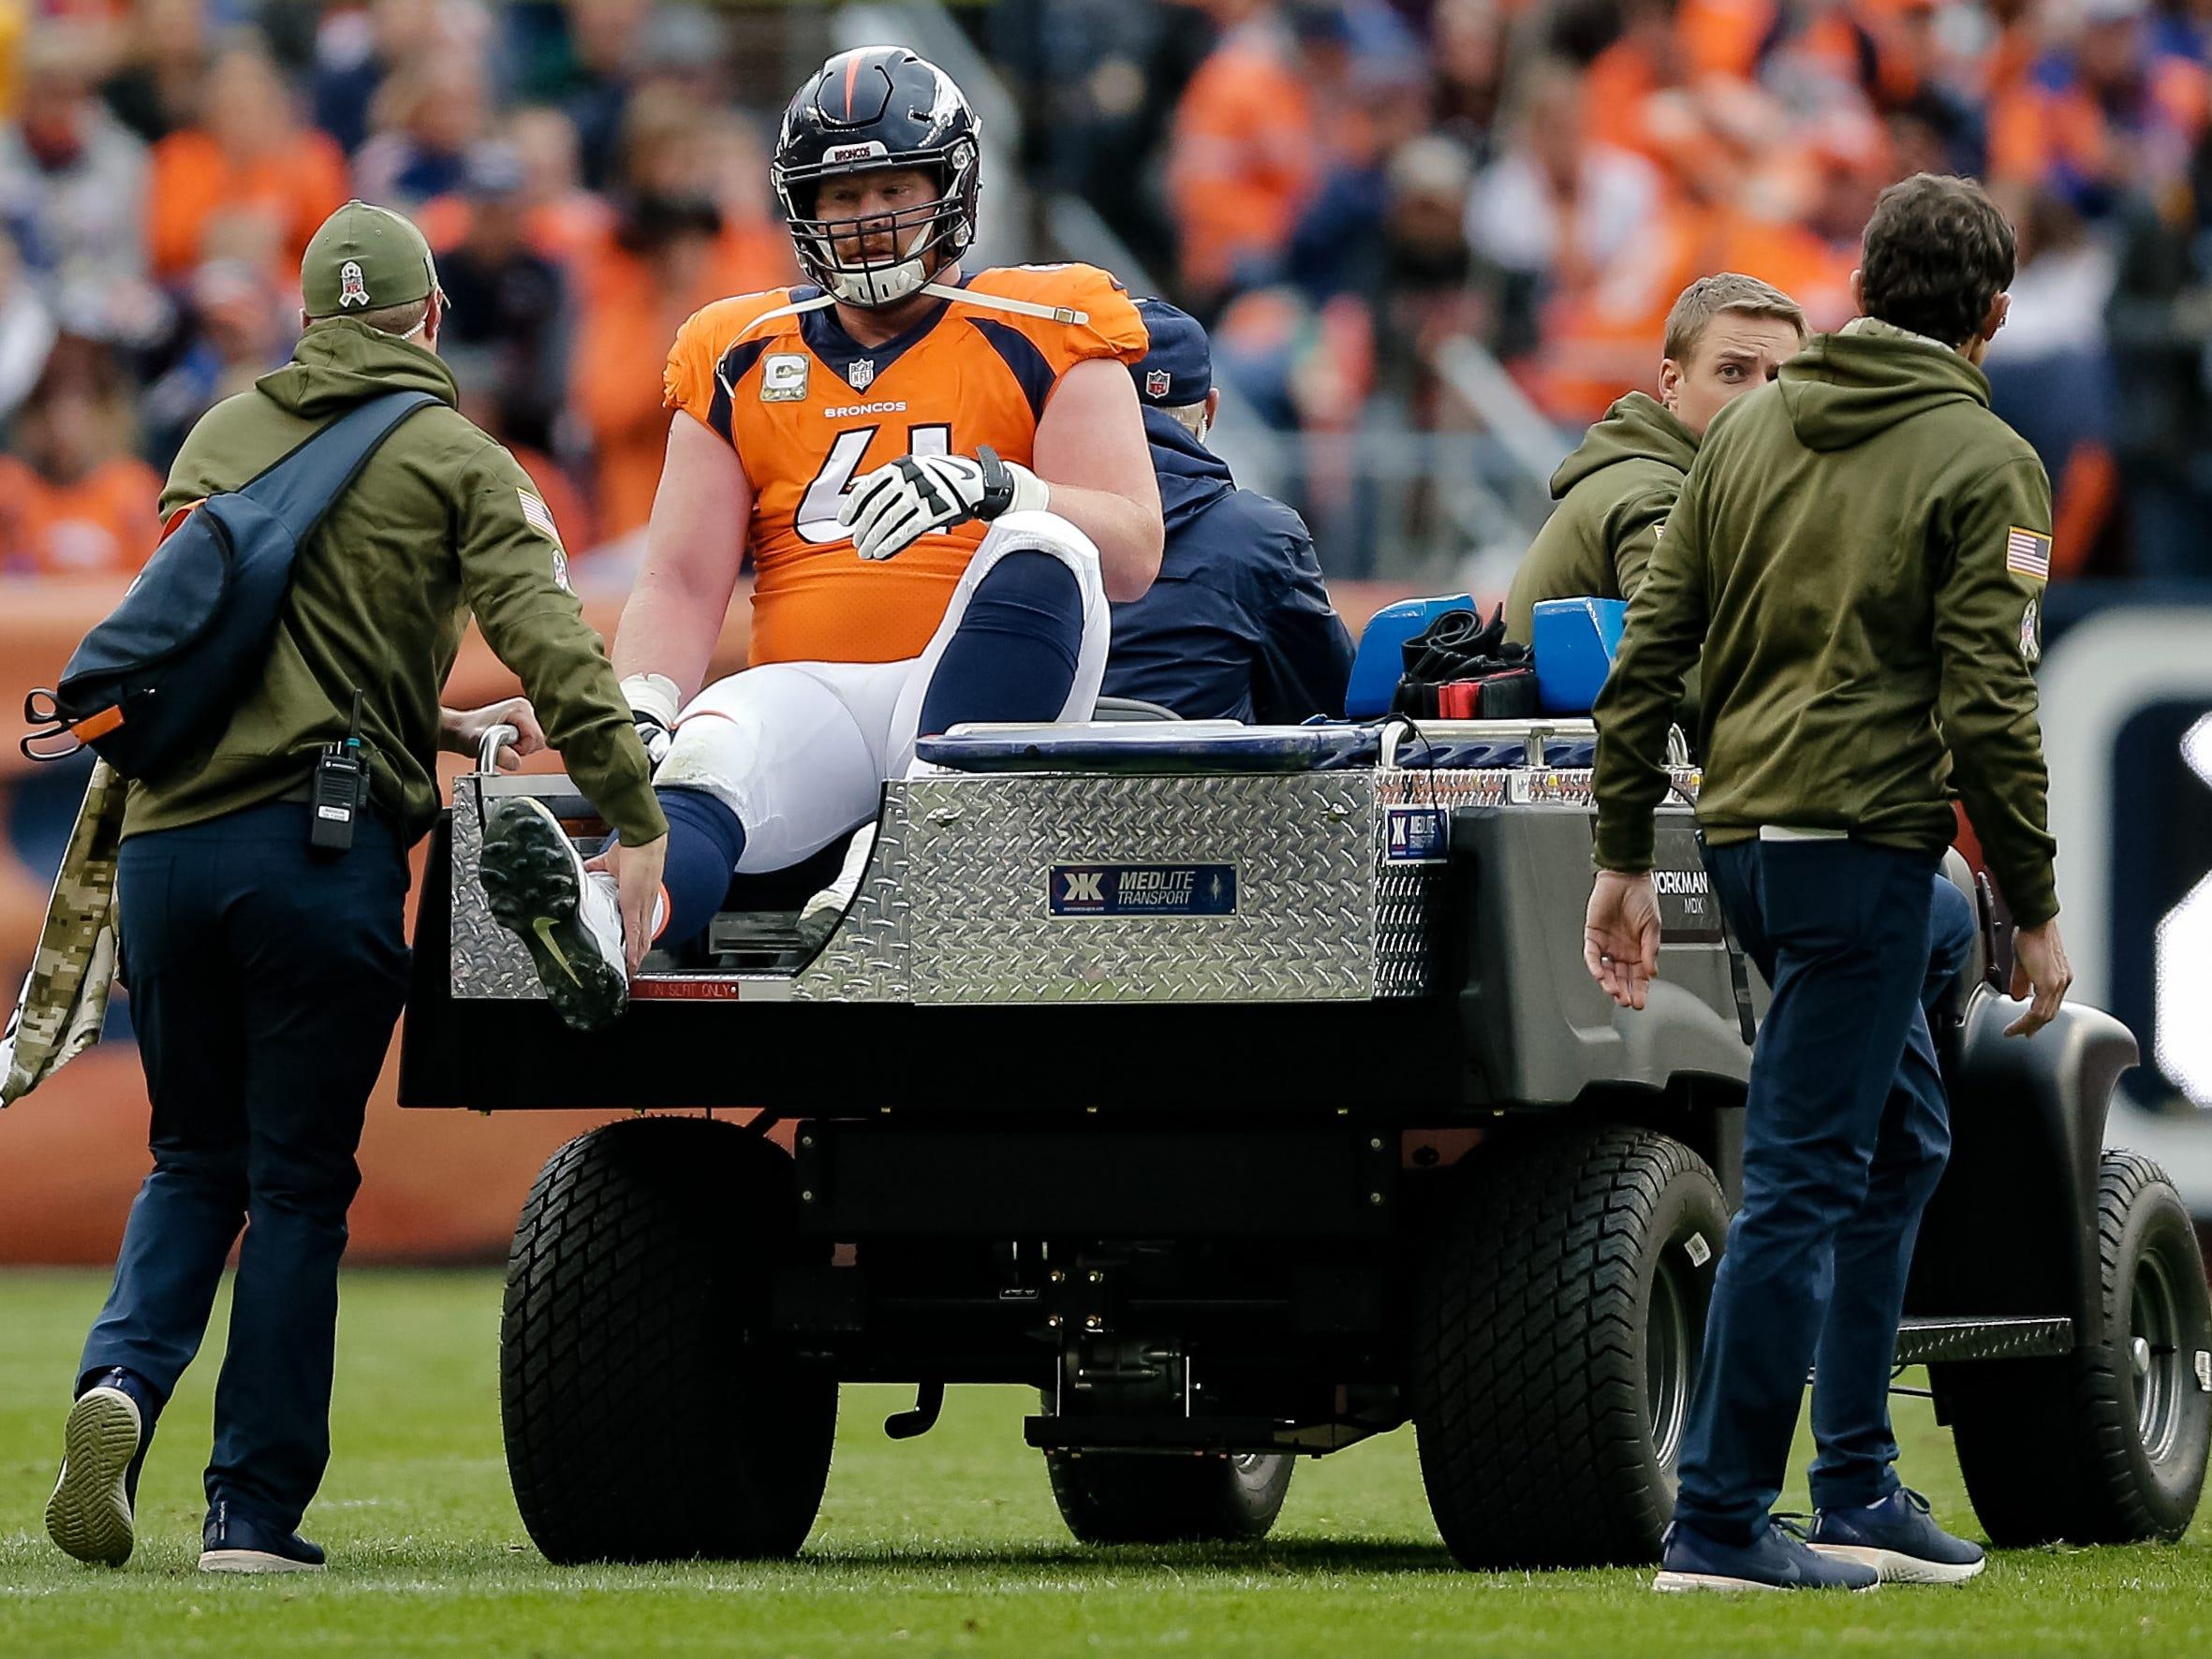 Matt Paradis, center, Denver Broncos (fractured right fibula, out for season)